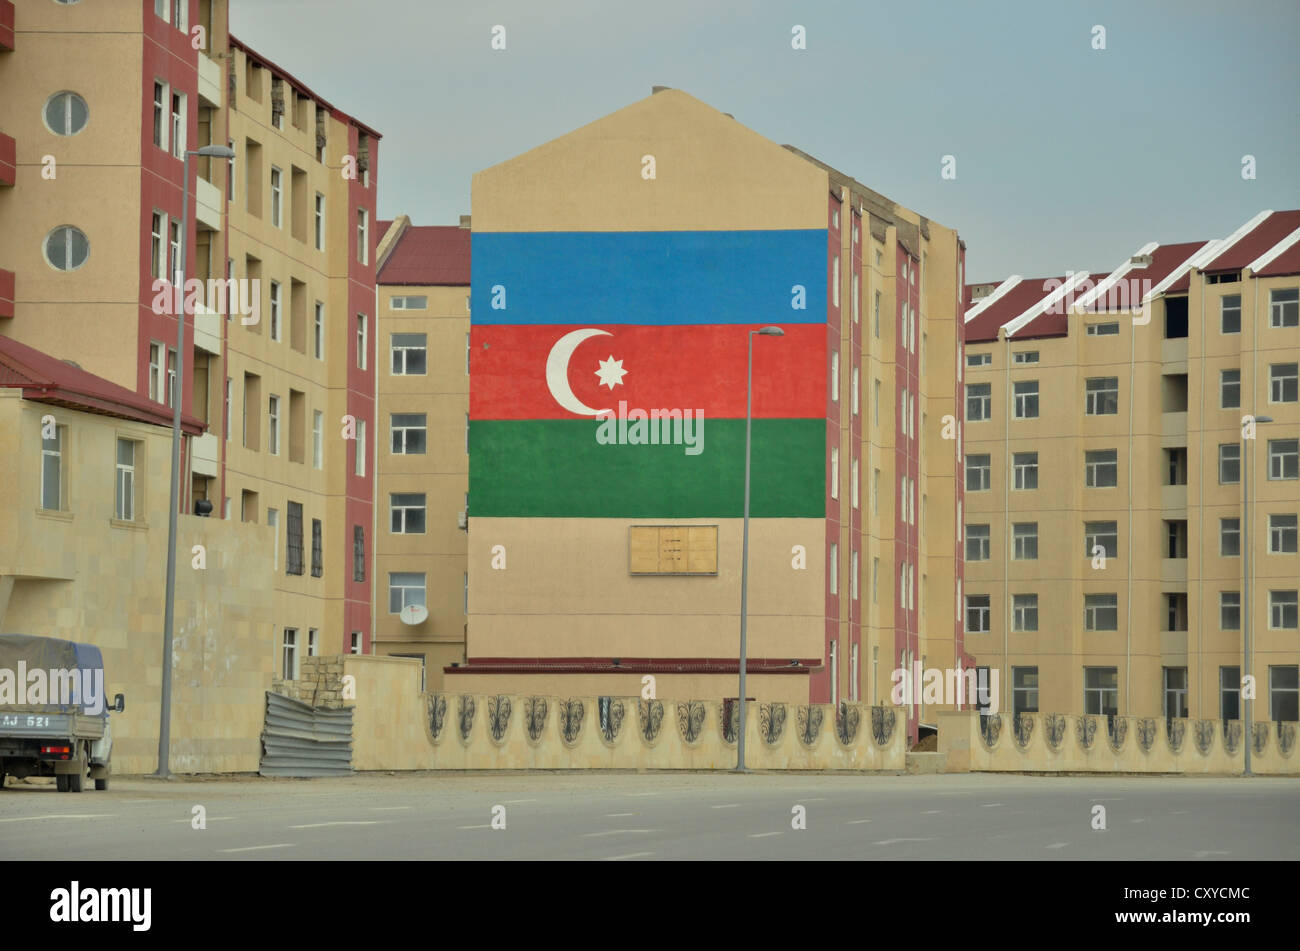 Azerbaijani national flag on a wall, Baku, Azerbaijan, Caucasus, Middle East, Asia - Stock Image